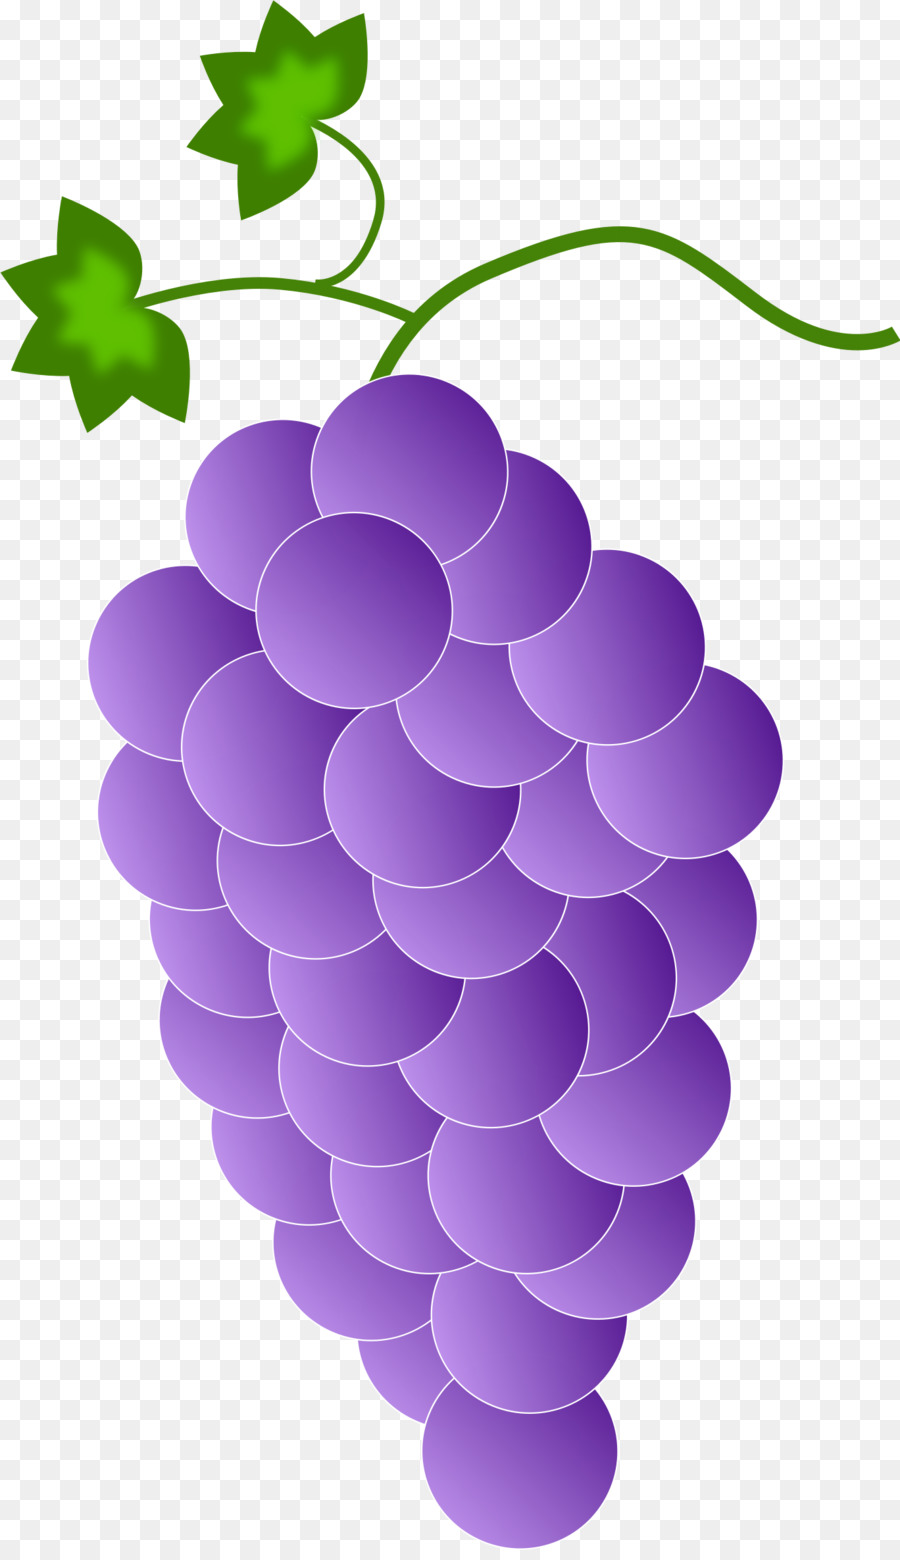 Grapes clipart purple food. Grape cartoon wine transparent